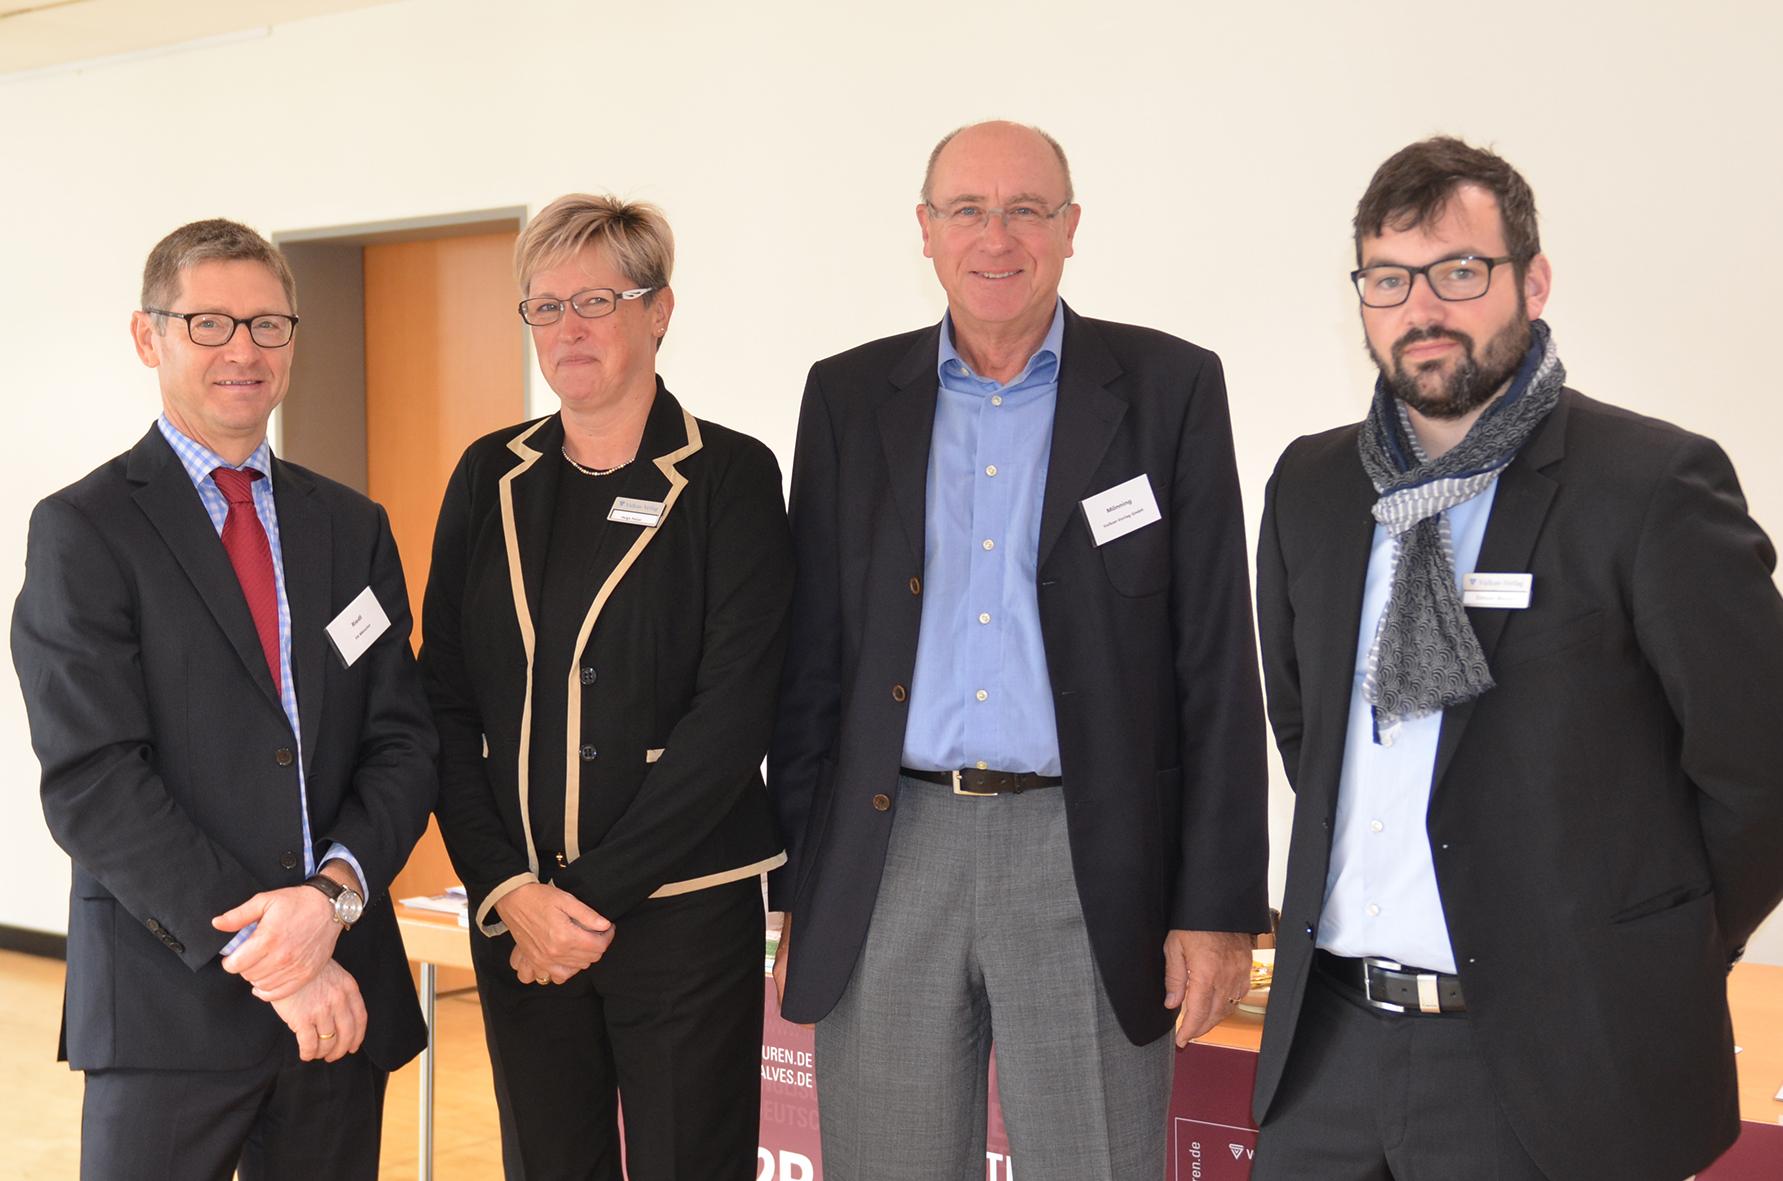 Prof. Dr. Alexander Riedl, Helga Pelzer, Wolfgang Mönning und Simon Meyer